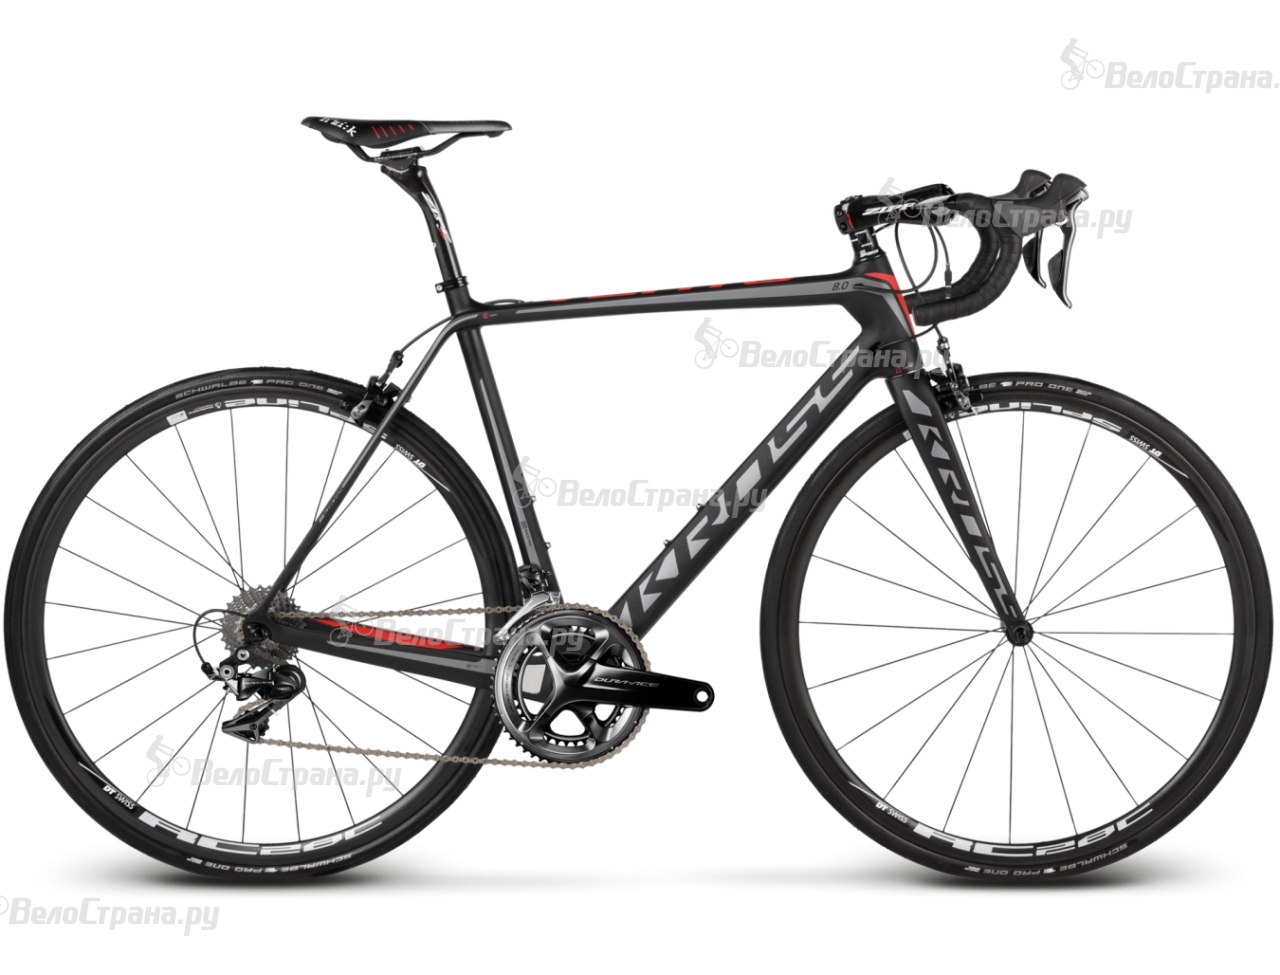 Велосипед Kross VENTO 8.0 (2017) велосипед kross vento 6 0 2017